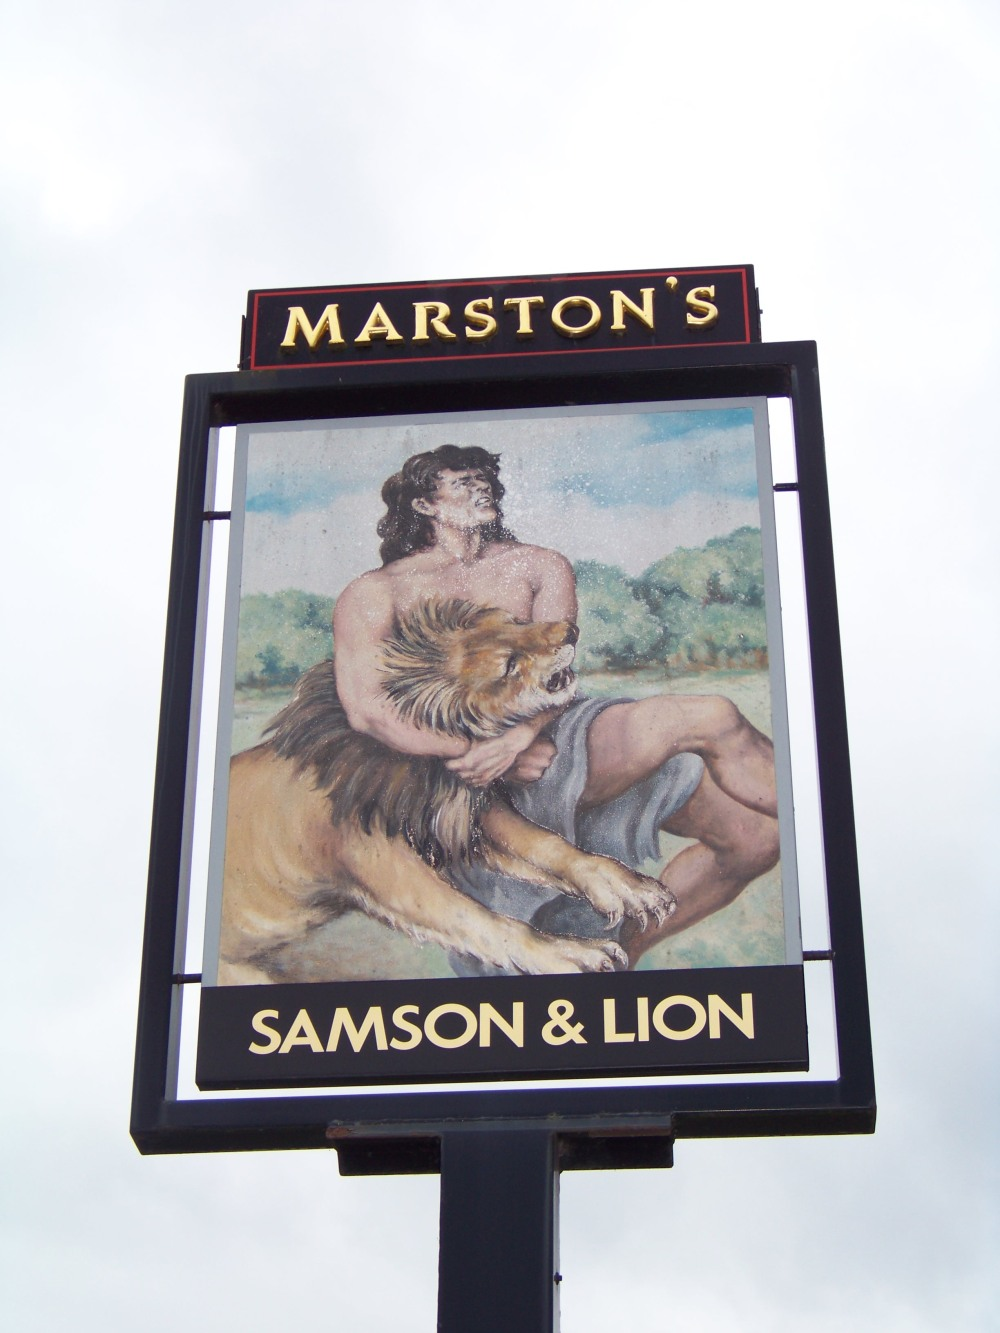 Samson & Lion